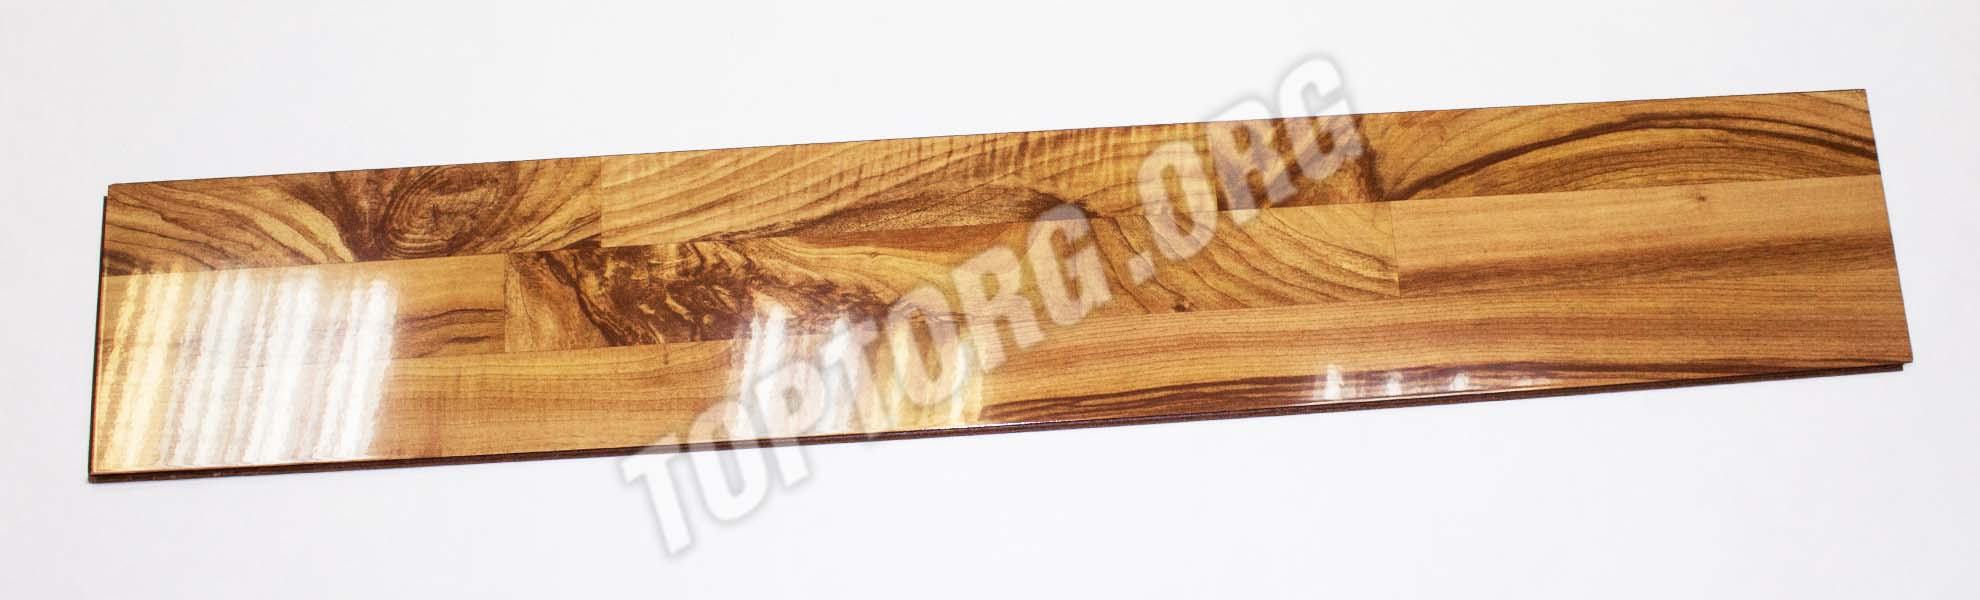 глянцевый ламинат Imperial Ibiza Орех молодой 848